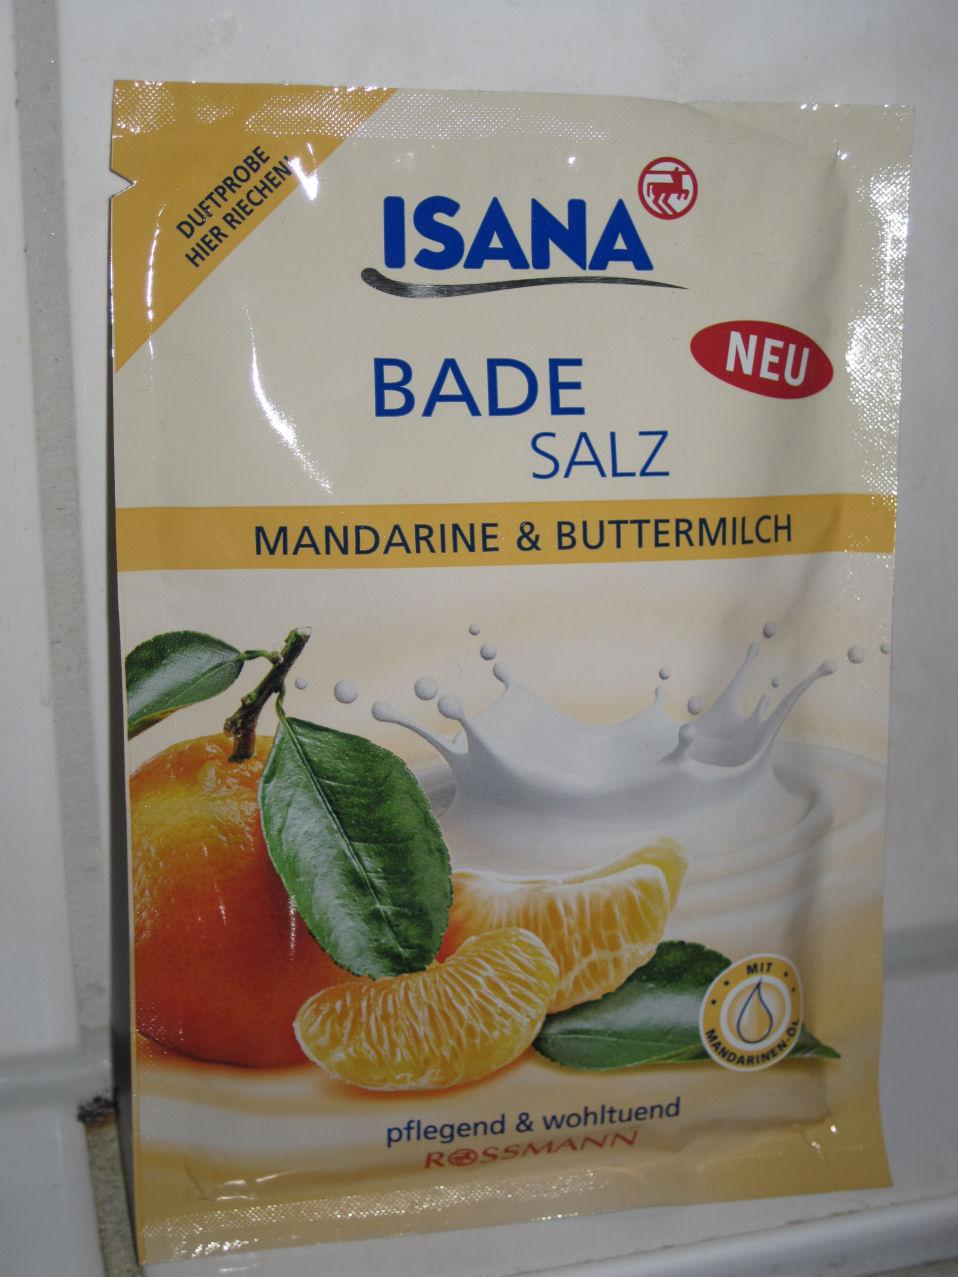 http://lacquediction.blogspot.de/2014/04/isana-badesalz-mandarine-buttermilch.html